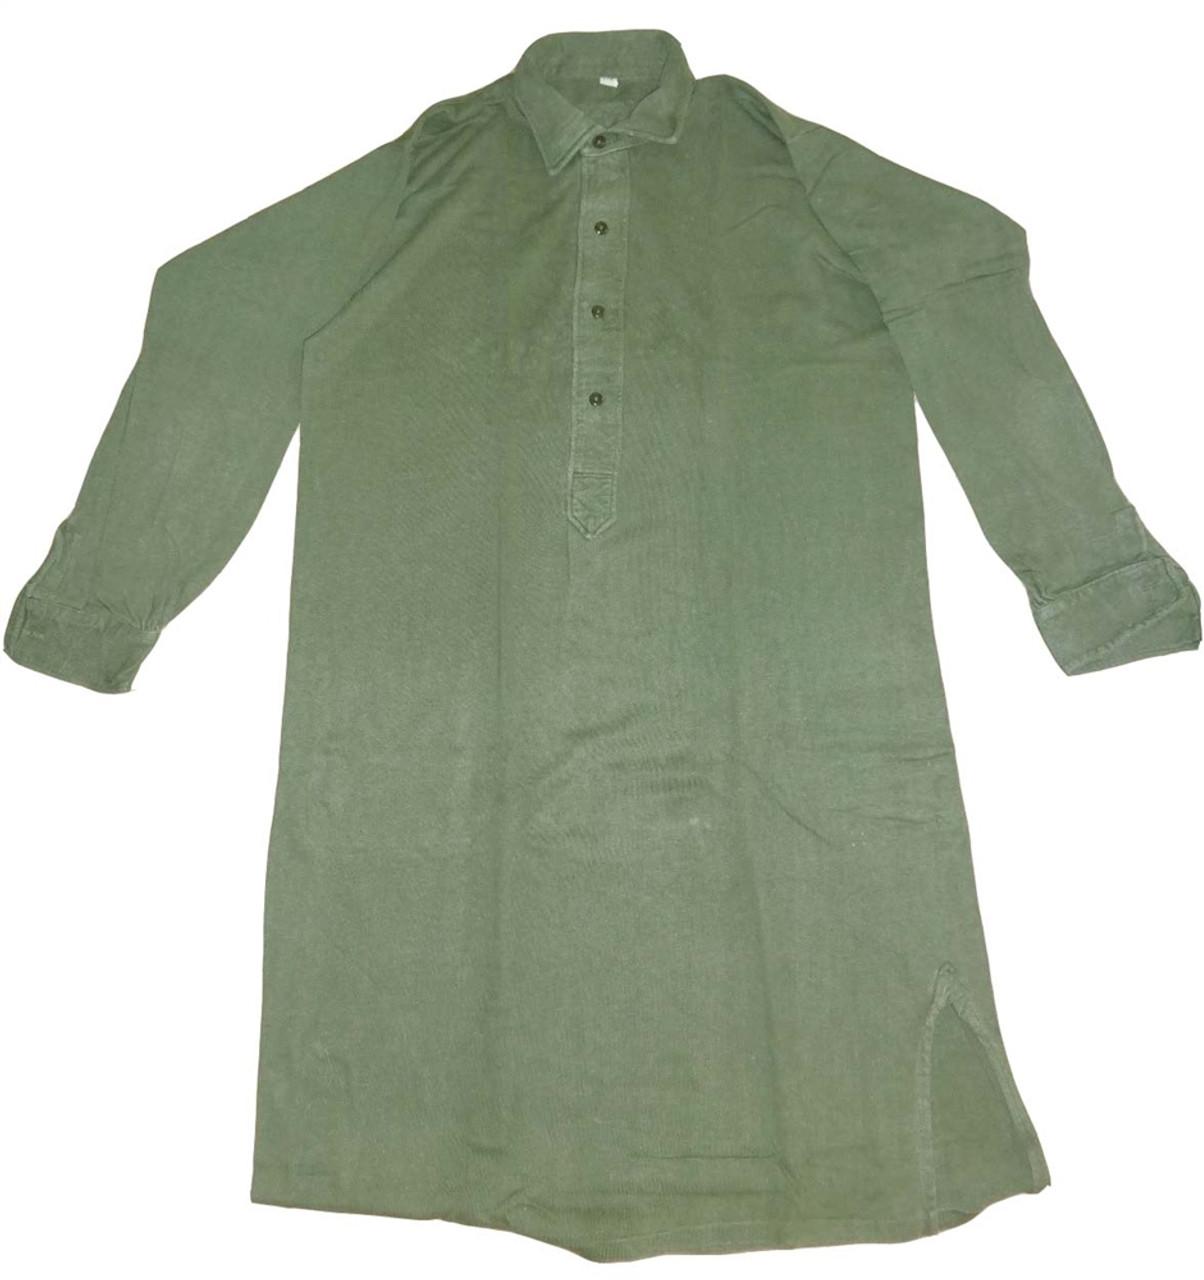 Original German BW OD Button Front Tricot Shirt from Hessen Surplus